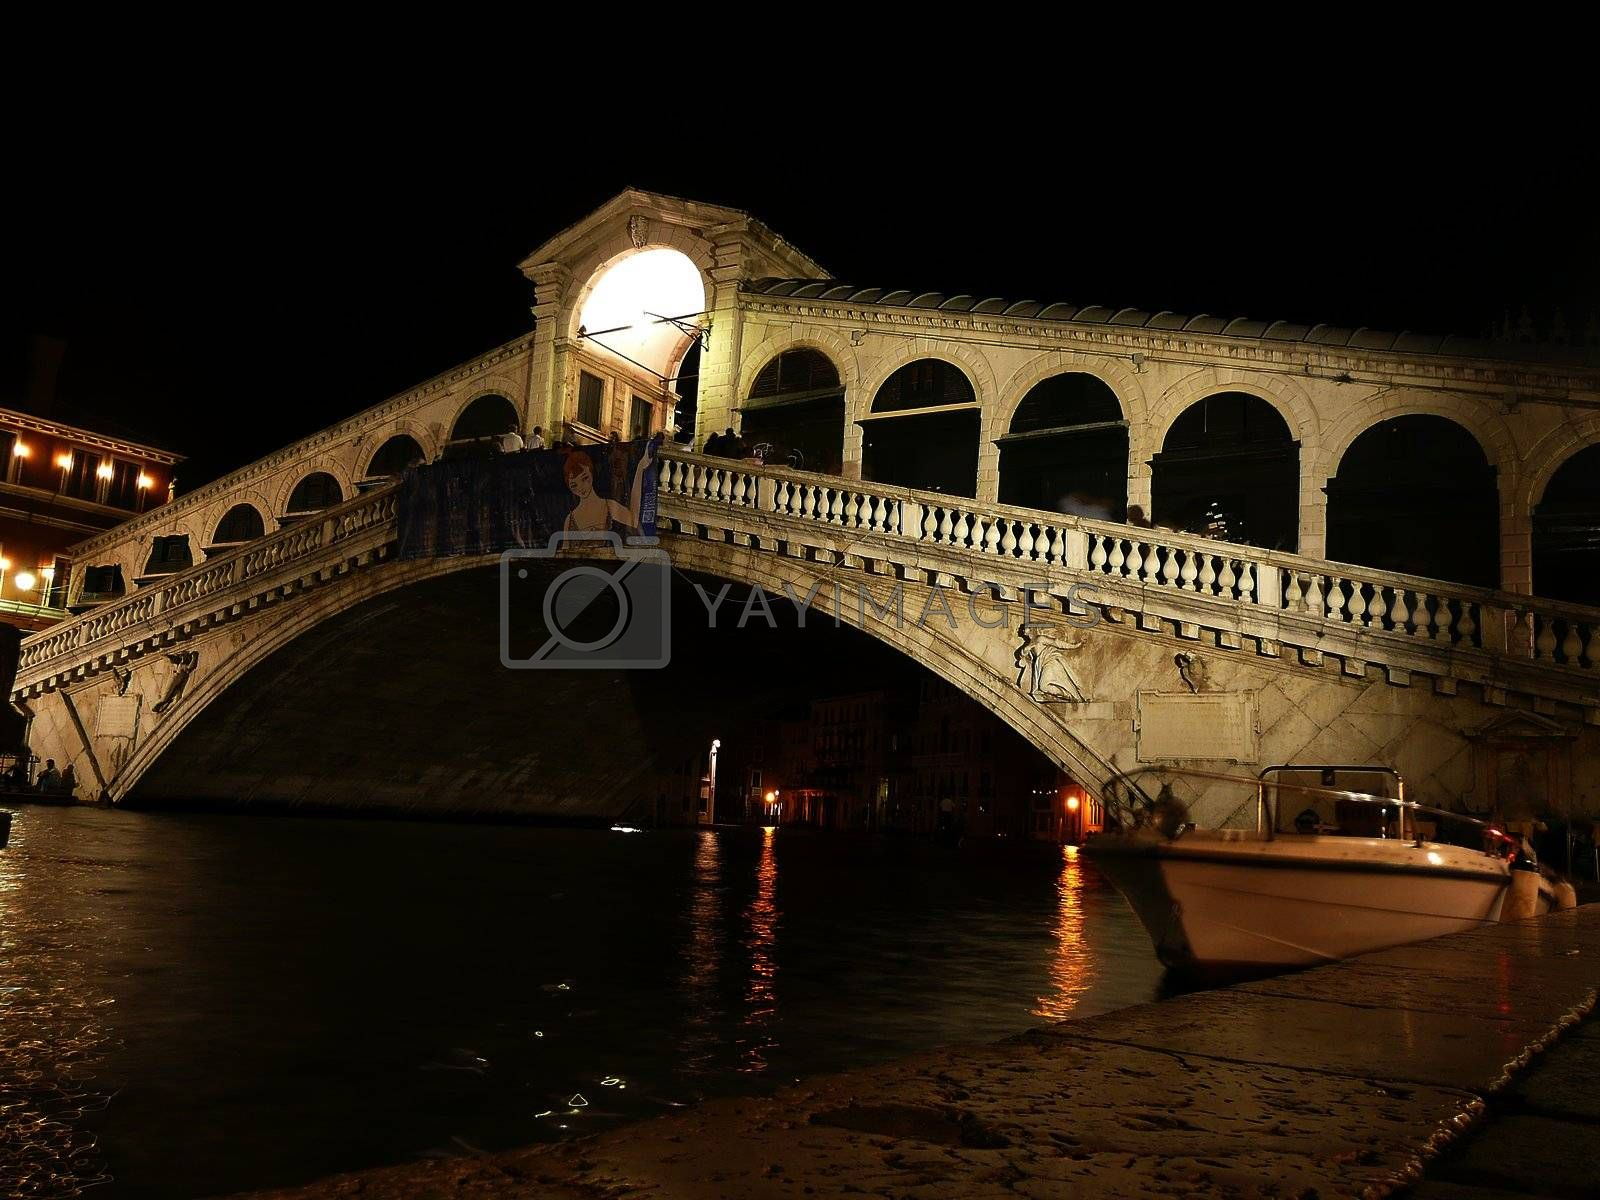 View of the Rialto Bridge at night, Venice, Italy by Marco Rubino